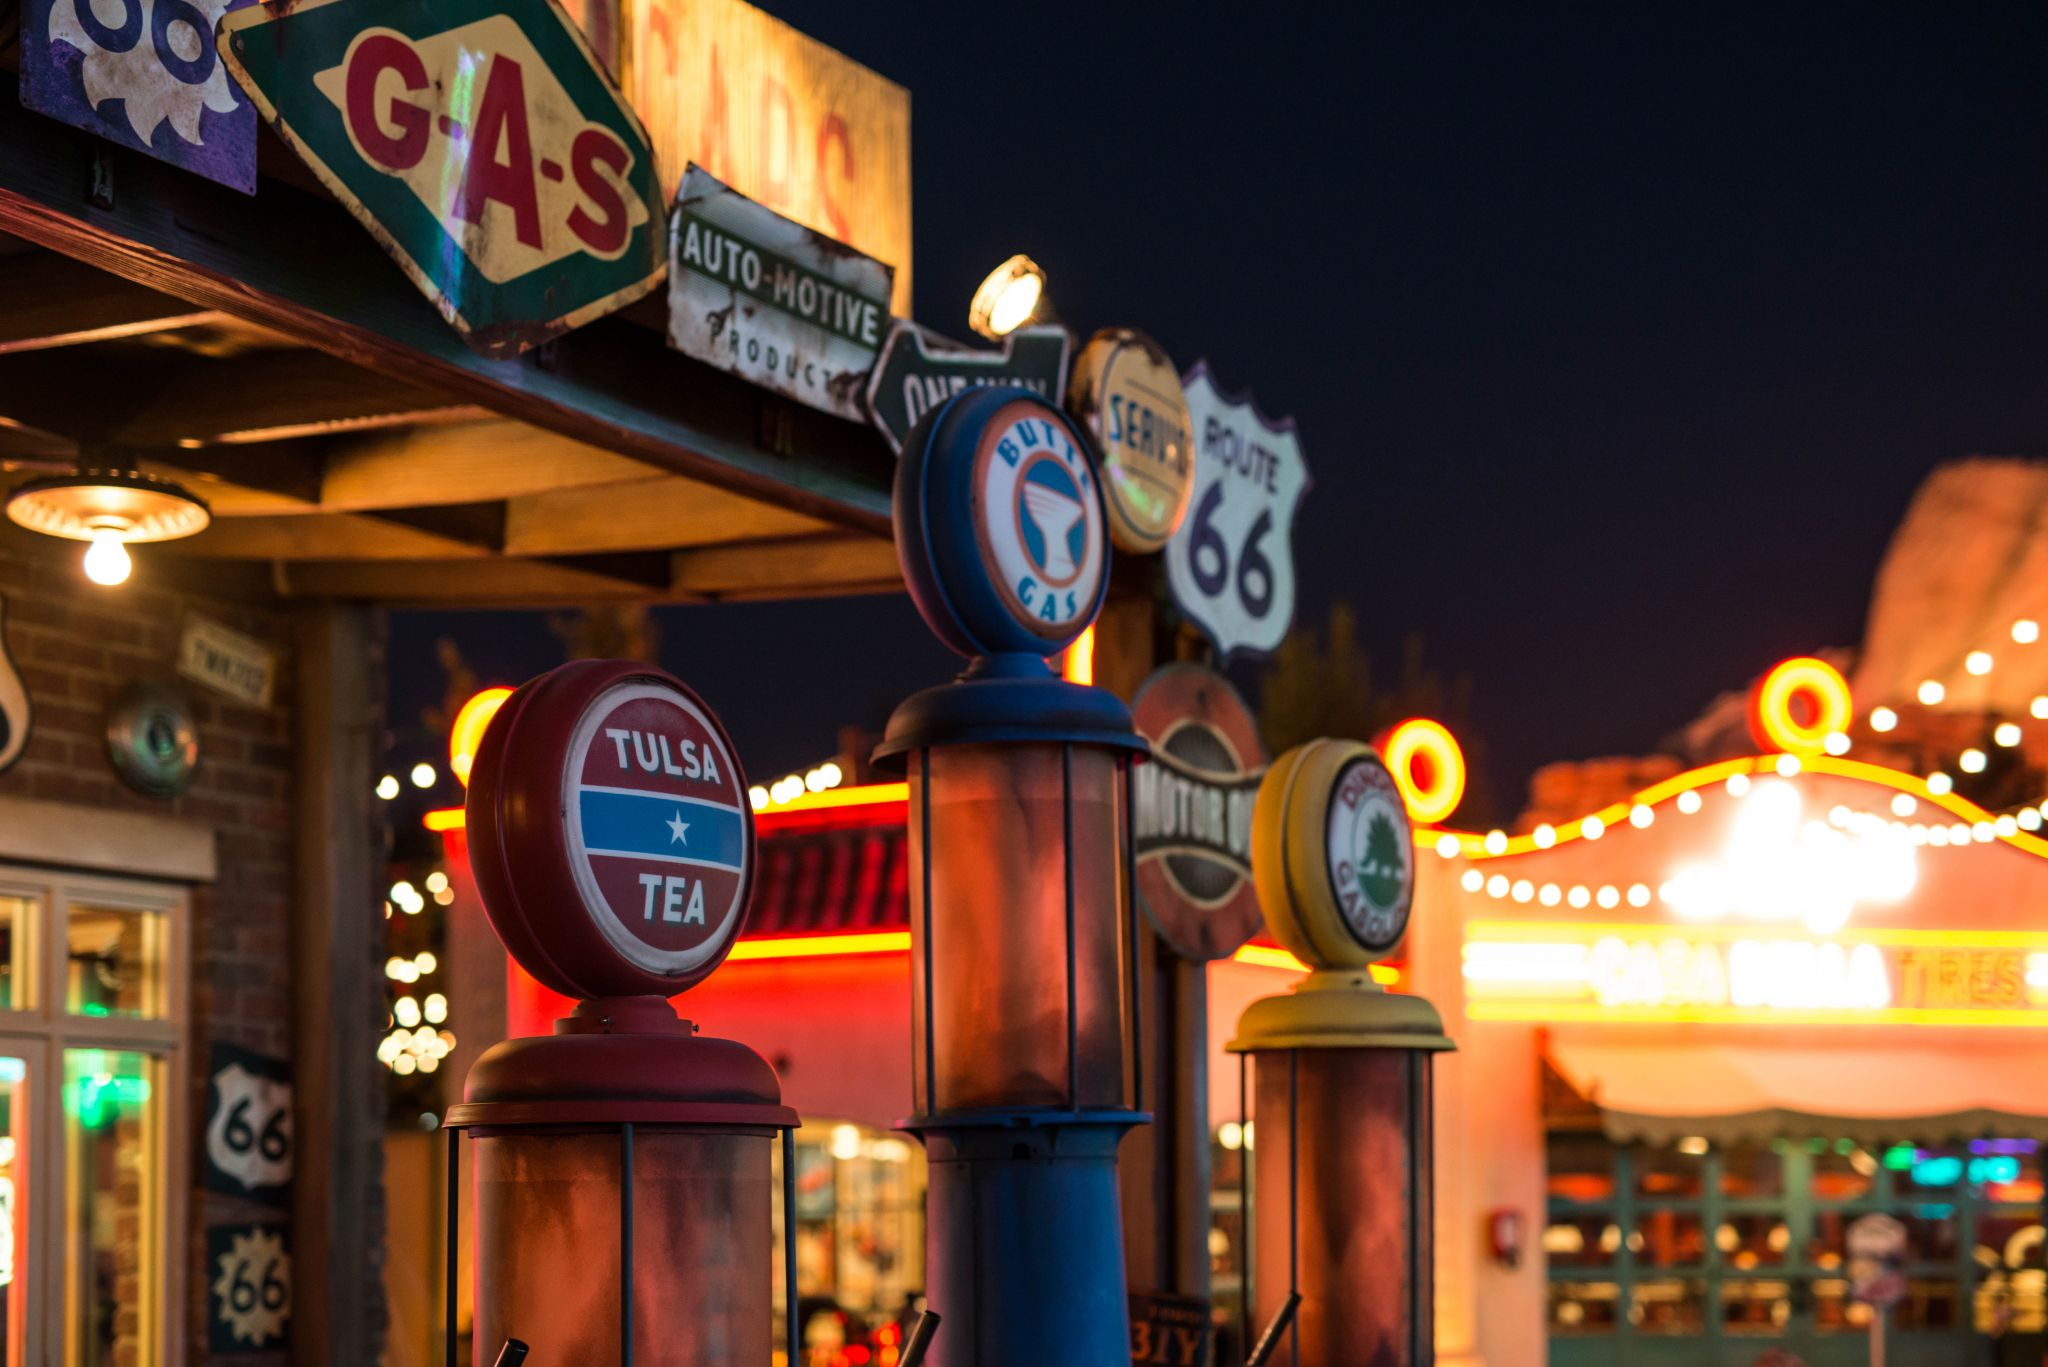 Disneyland Anaheim, USA